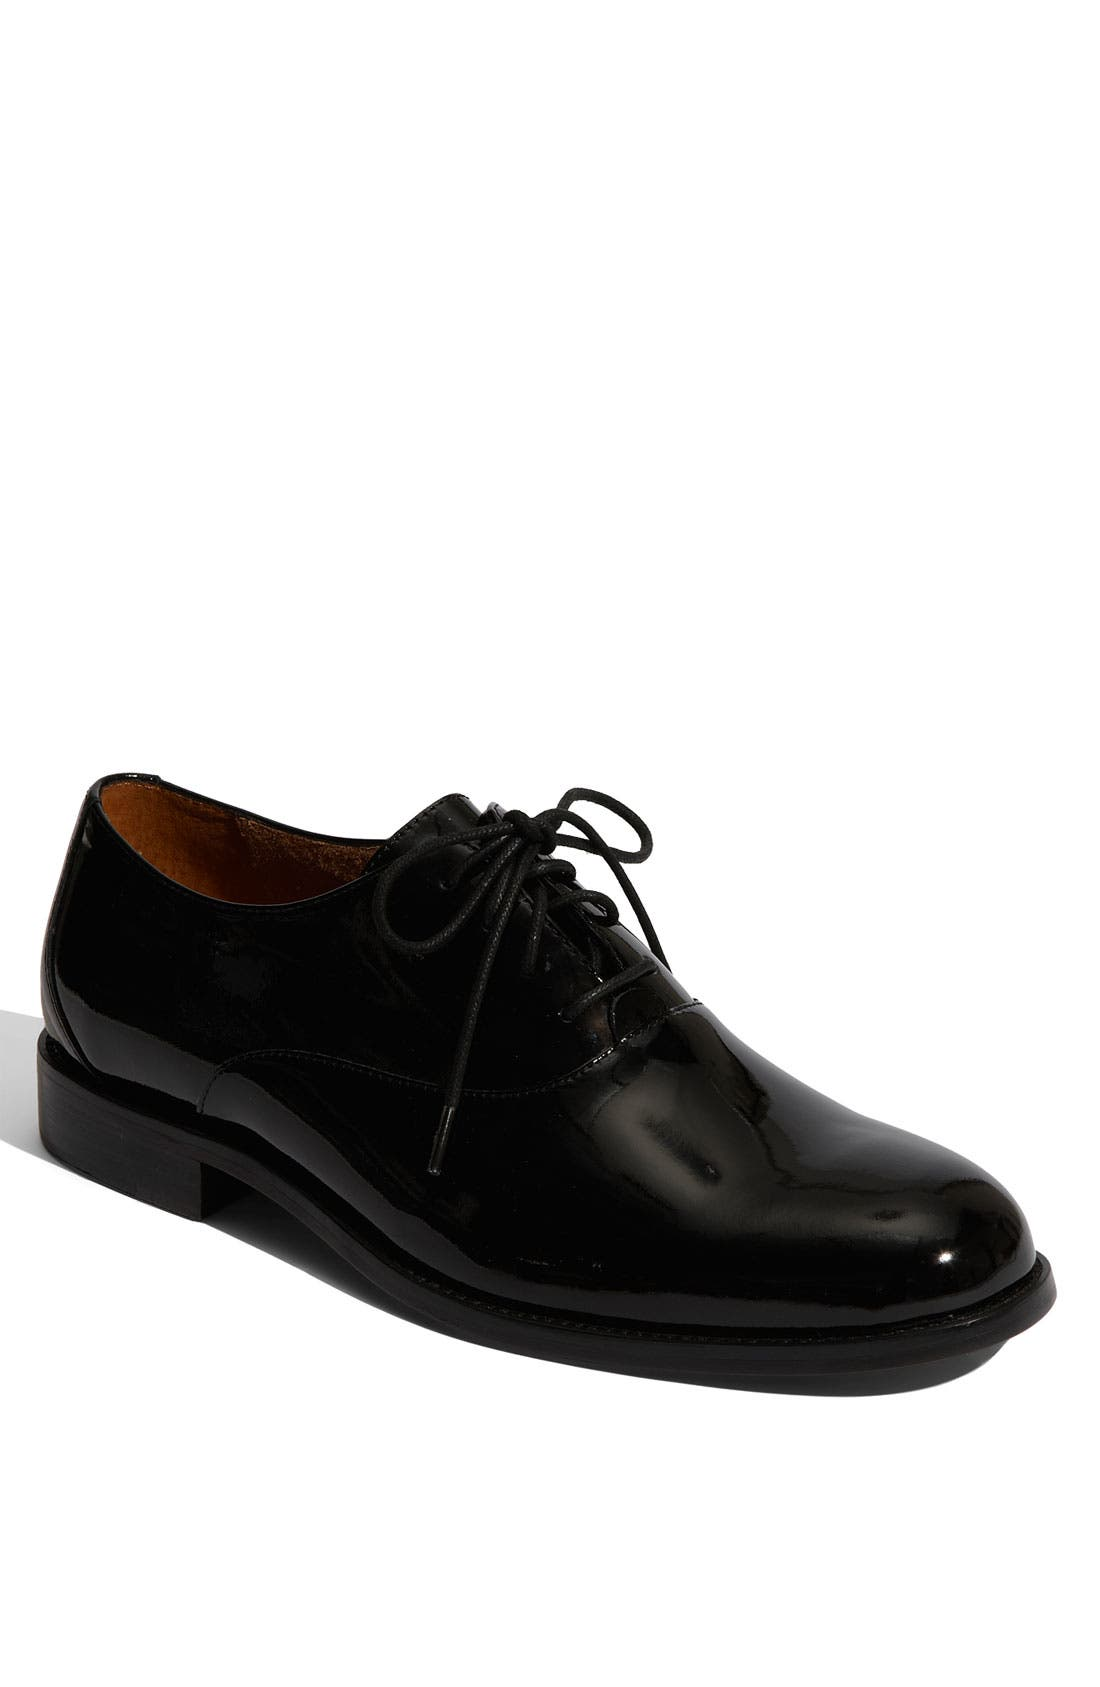 Florsheim 'Kingston' Patent Leather Oxford (Men)